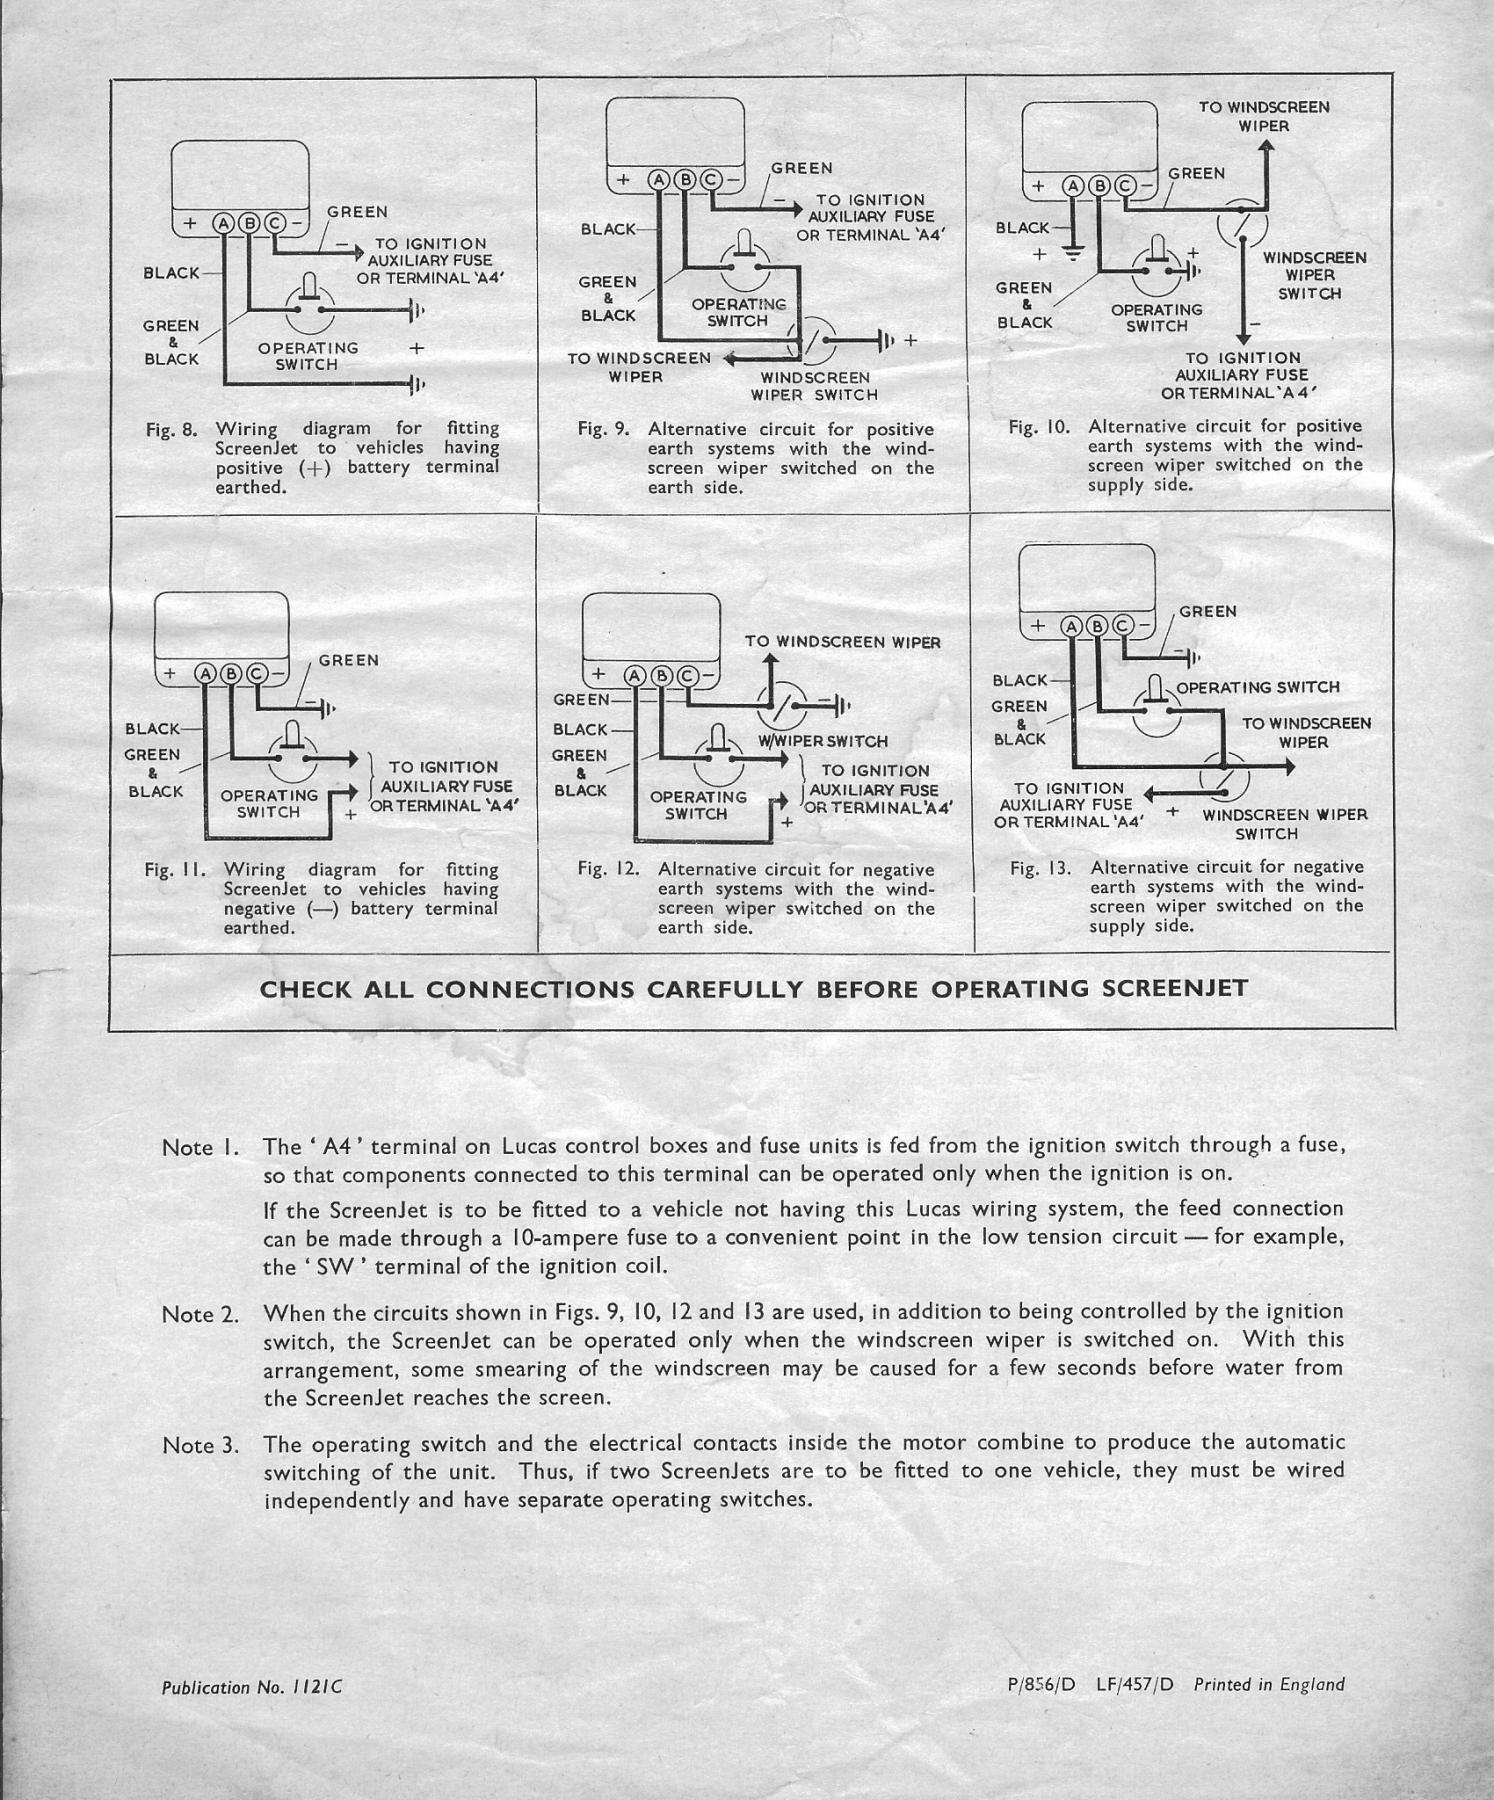 hight resolution of jaguar mark 2 wiring diagram free download wiring diagrams fender jaguar wiring diagram how to